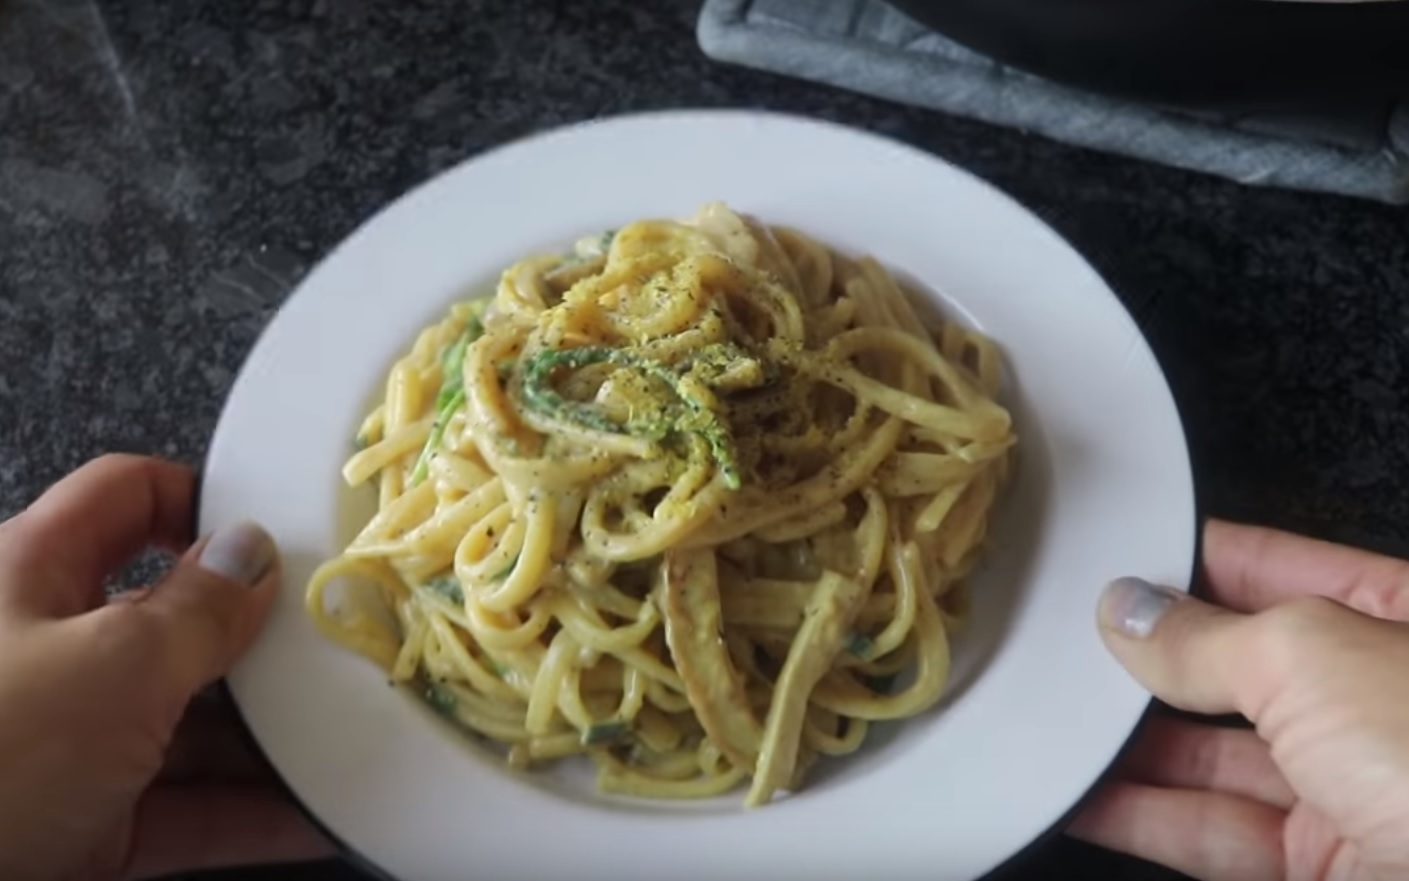 The Cheap Lazy Vegan shared this vegan Toowoomba Pasta dish to YouTube.